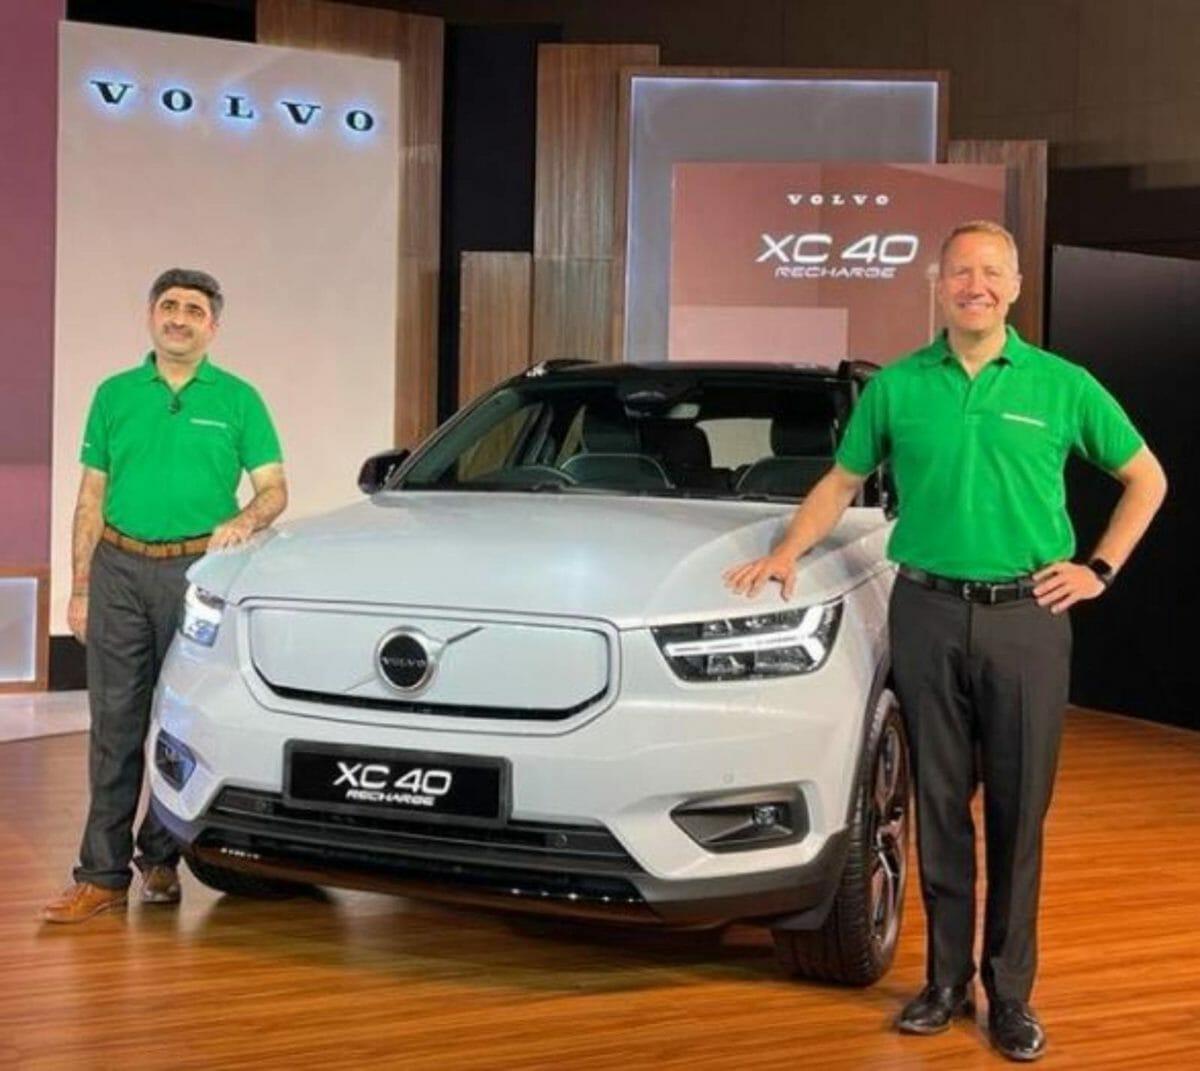 Volvo XC40 unveiled in India 2